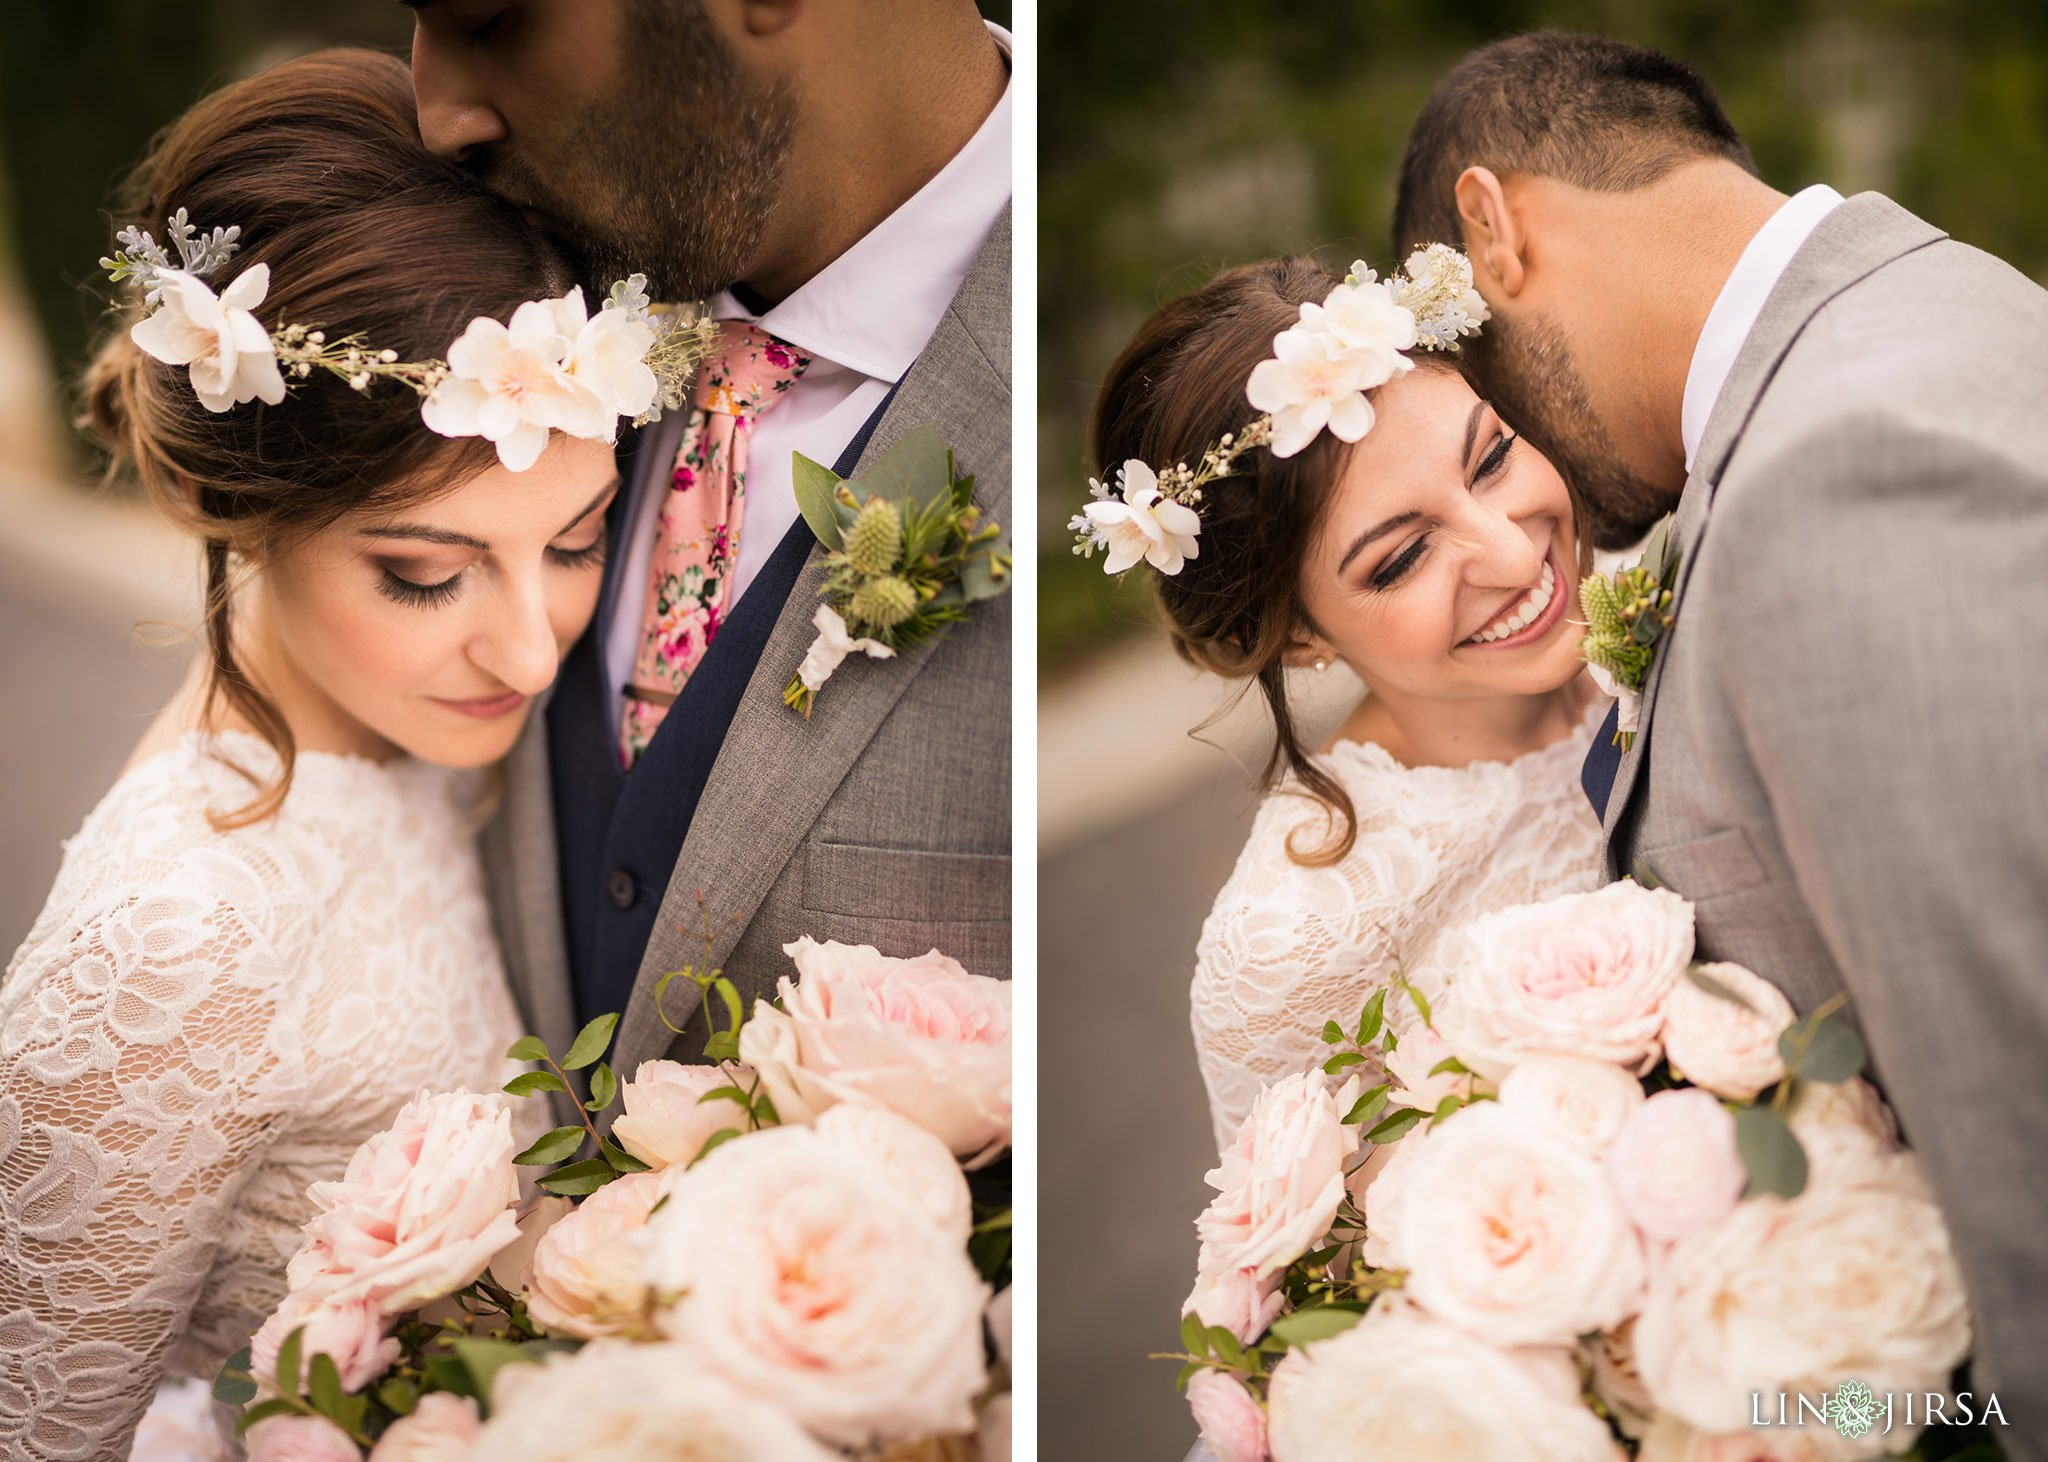 16-carmel-mountain-ranch-san-diego-pakistani-persian-muslim-wedding-photography.jpg